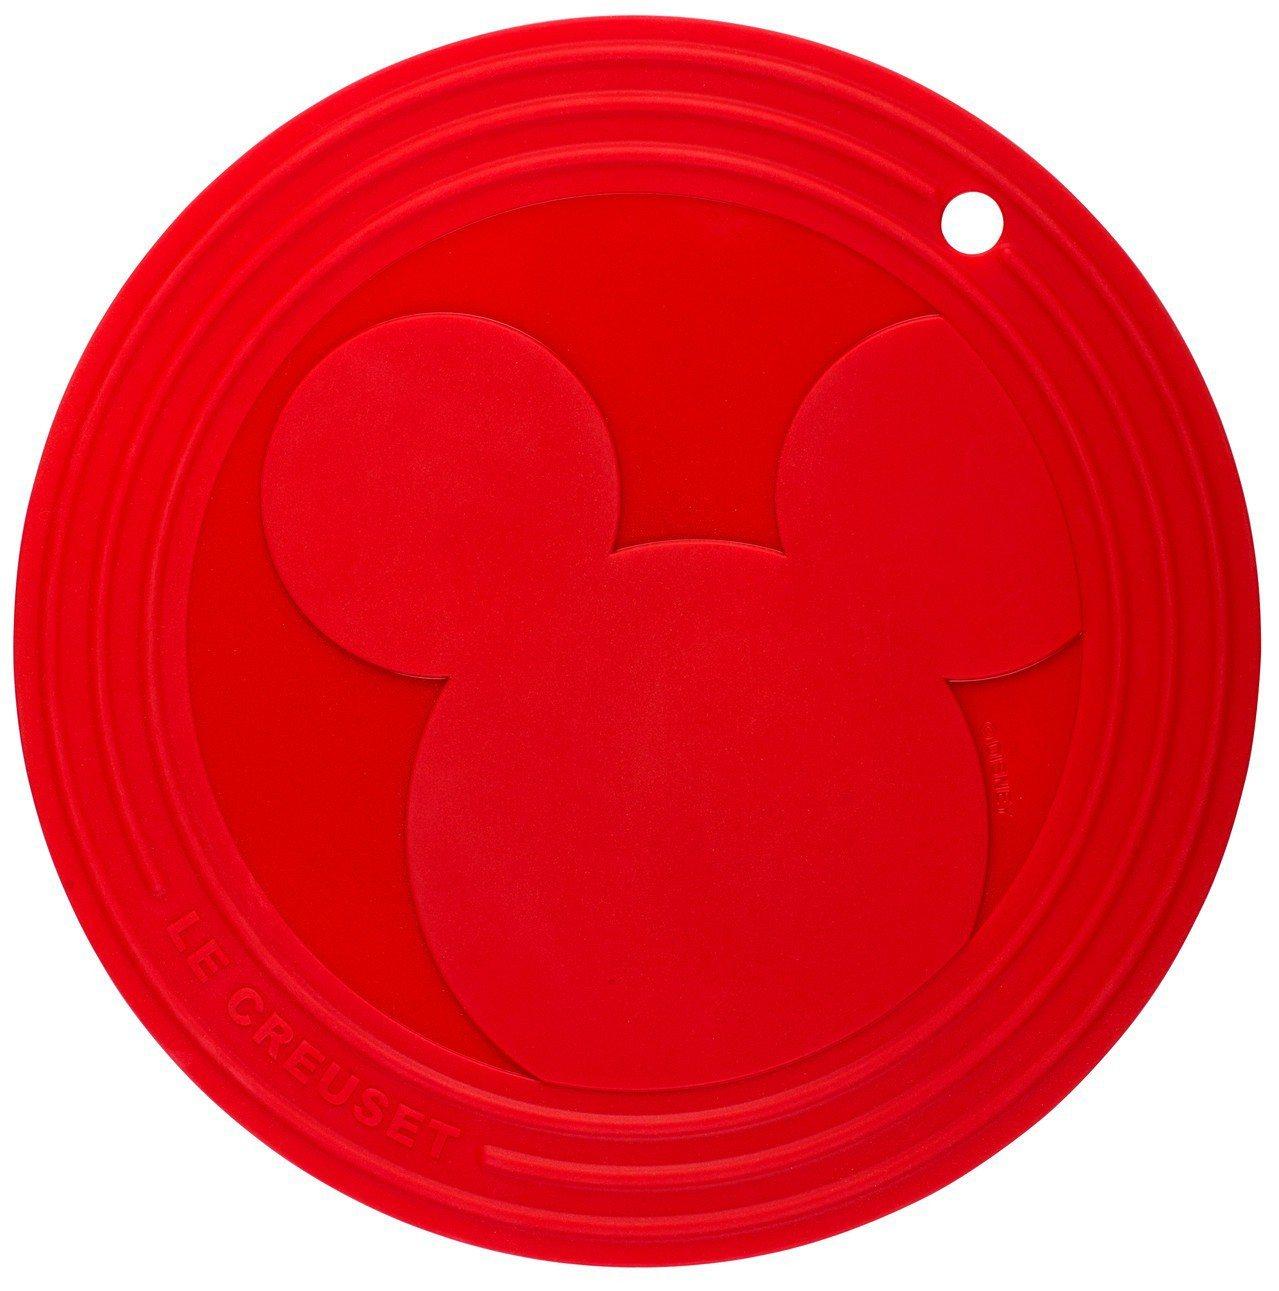 Mickey Mouse櫻桃紅隔熱墊,大大米奇圖樣超可愛。圖/Le Creuse...